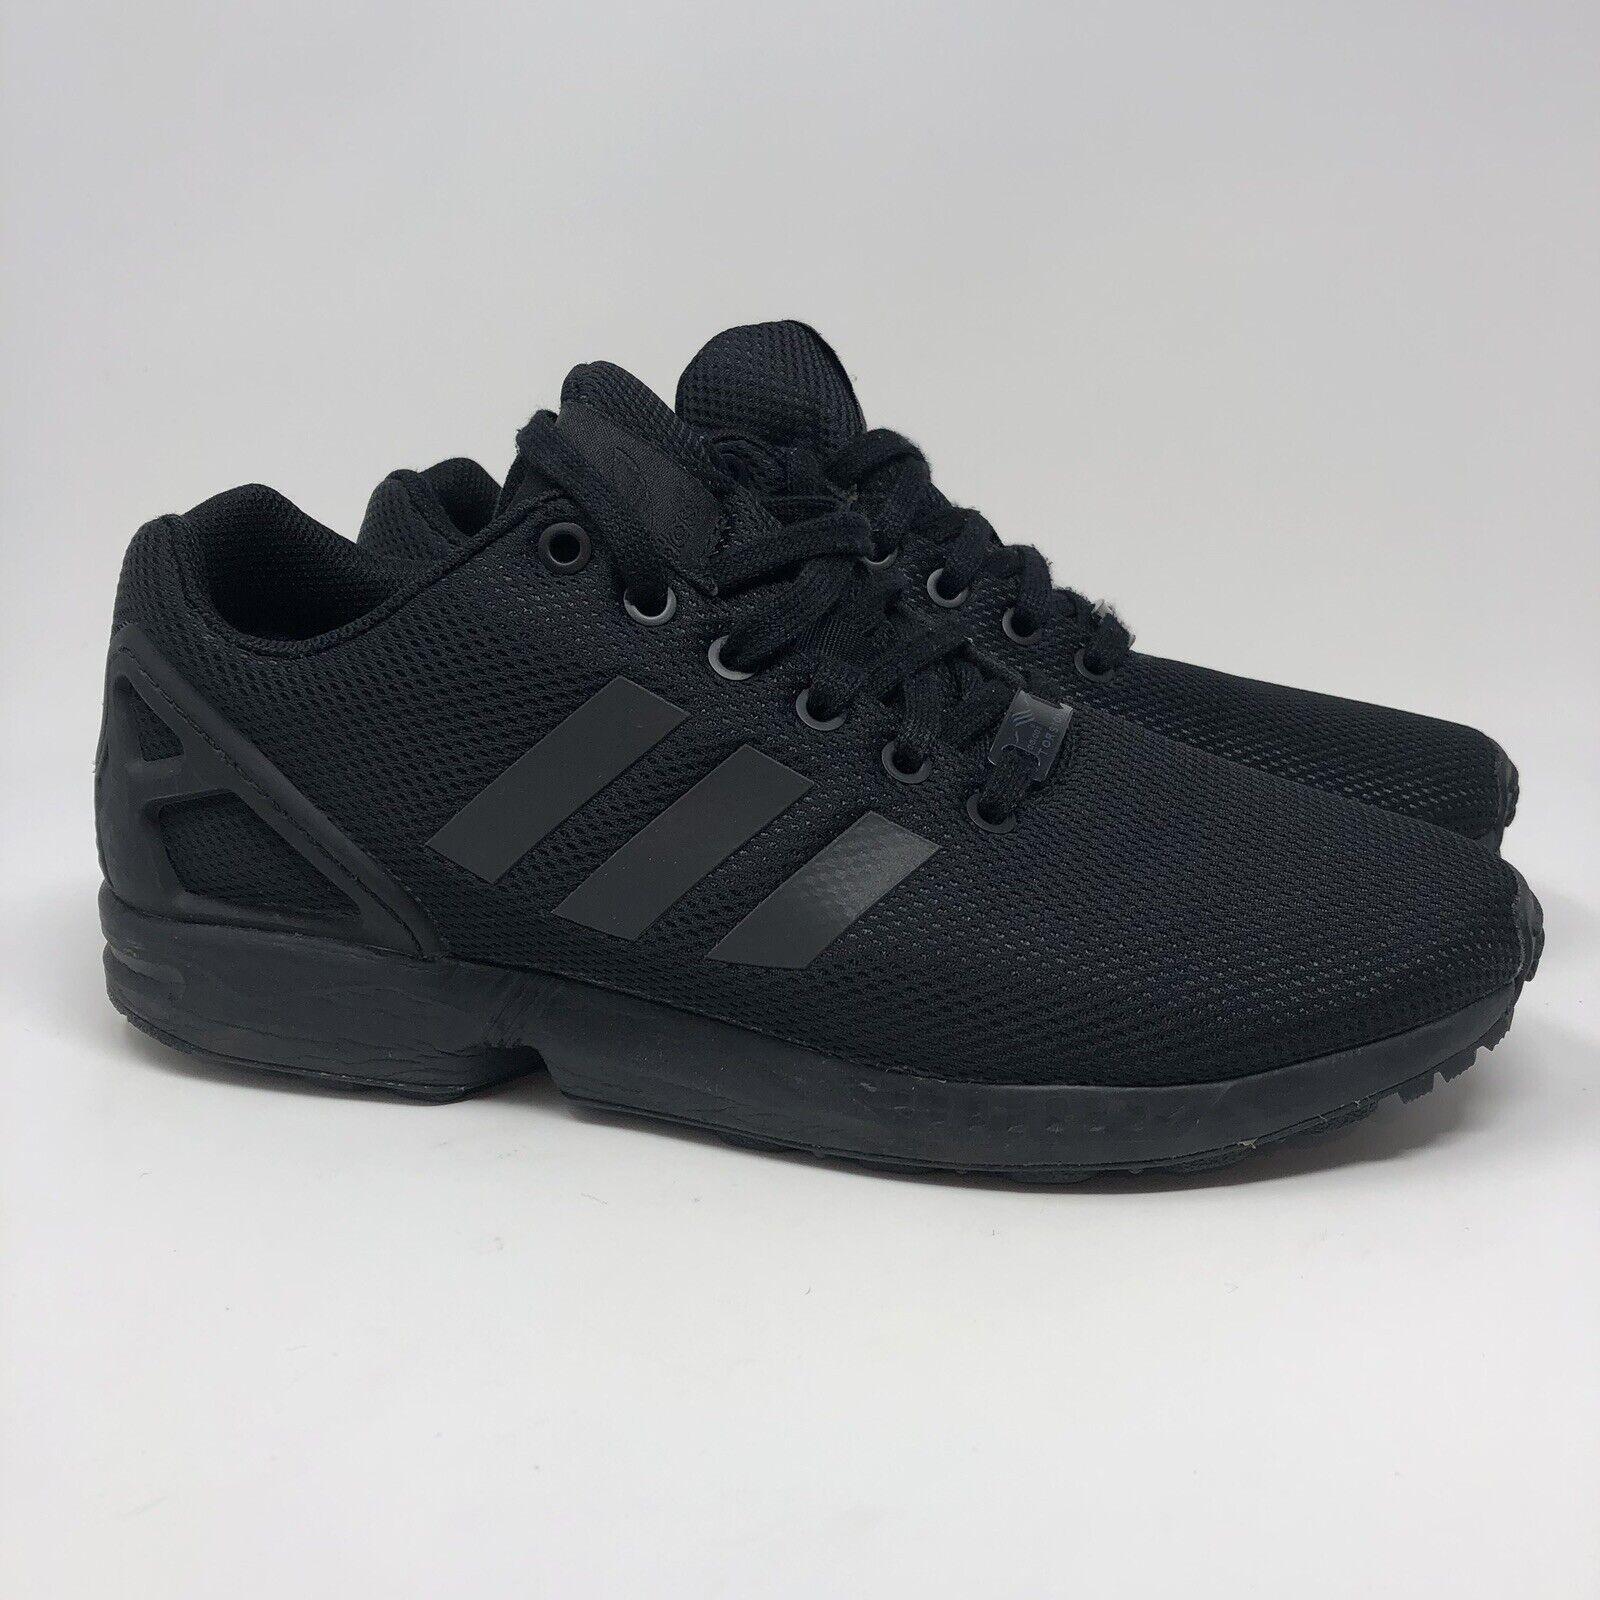 official photos dc0c9 db06e [Adidas] S79092 Original ZX Flux Triple Black Running Shoes Sneakers Mens  Size 9